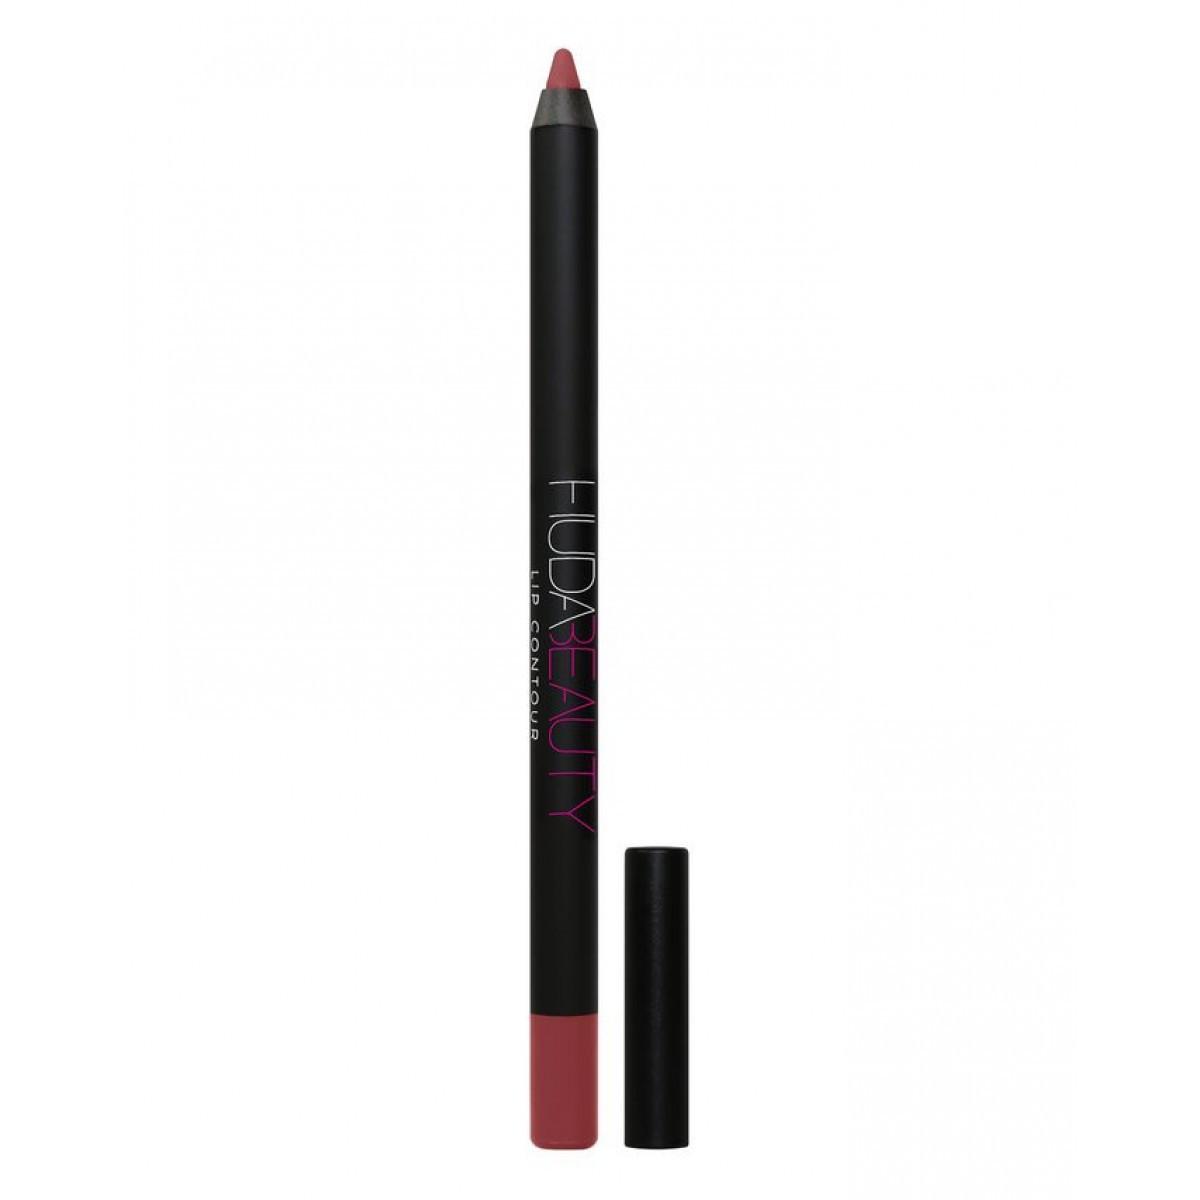 Олівець для губ Huda Beauty Lip Contour Matte Pencil Тон - Cheerleader